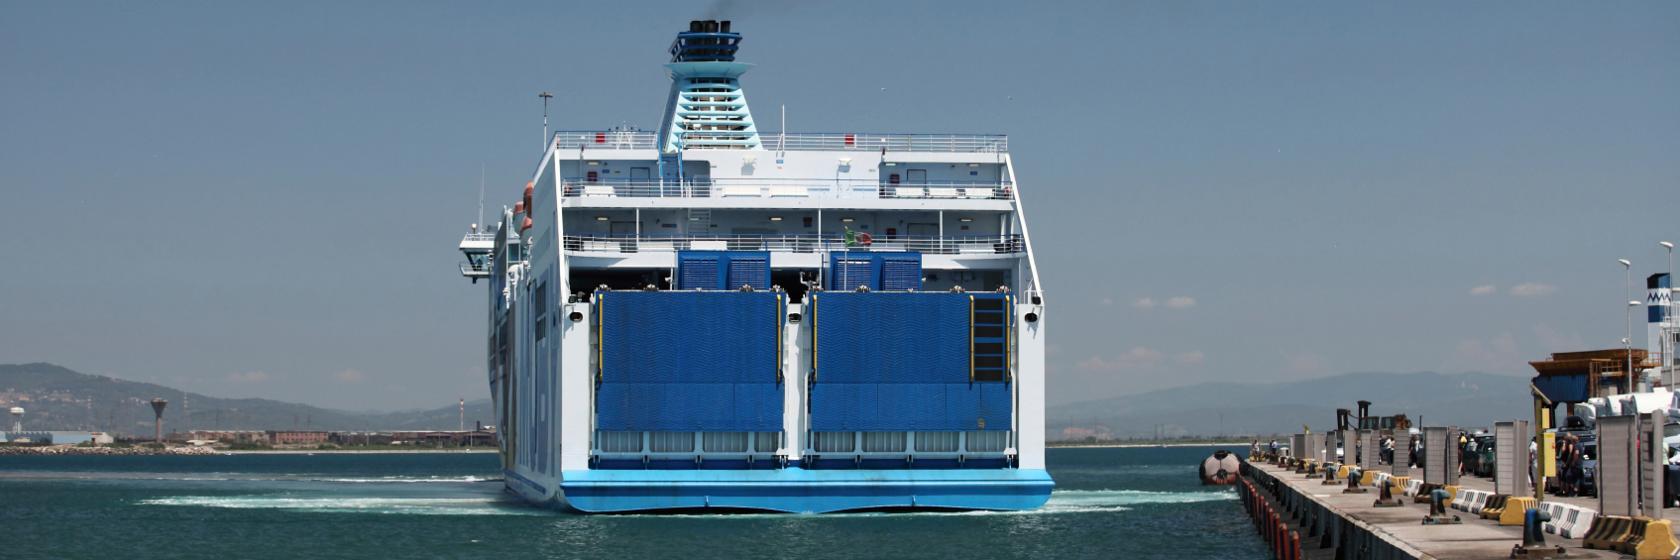 Ferry-v5